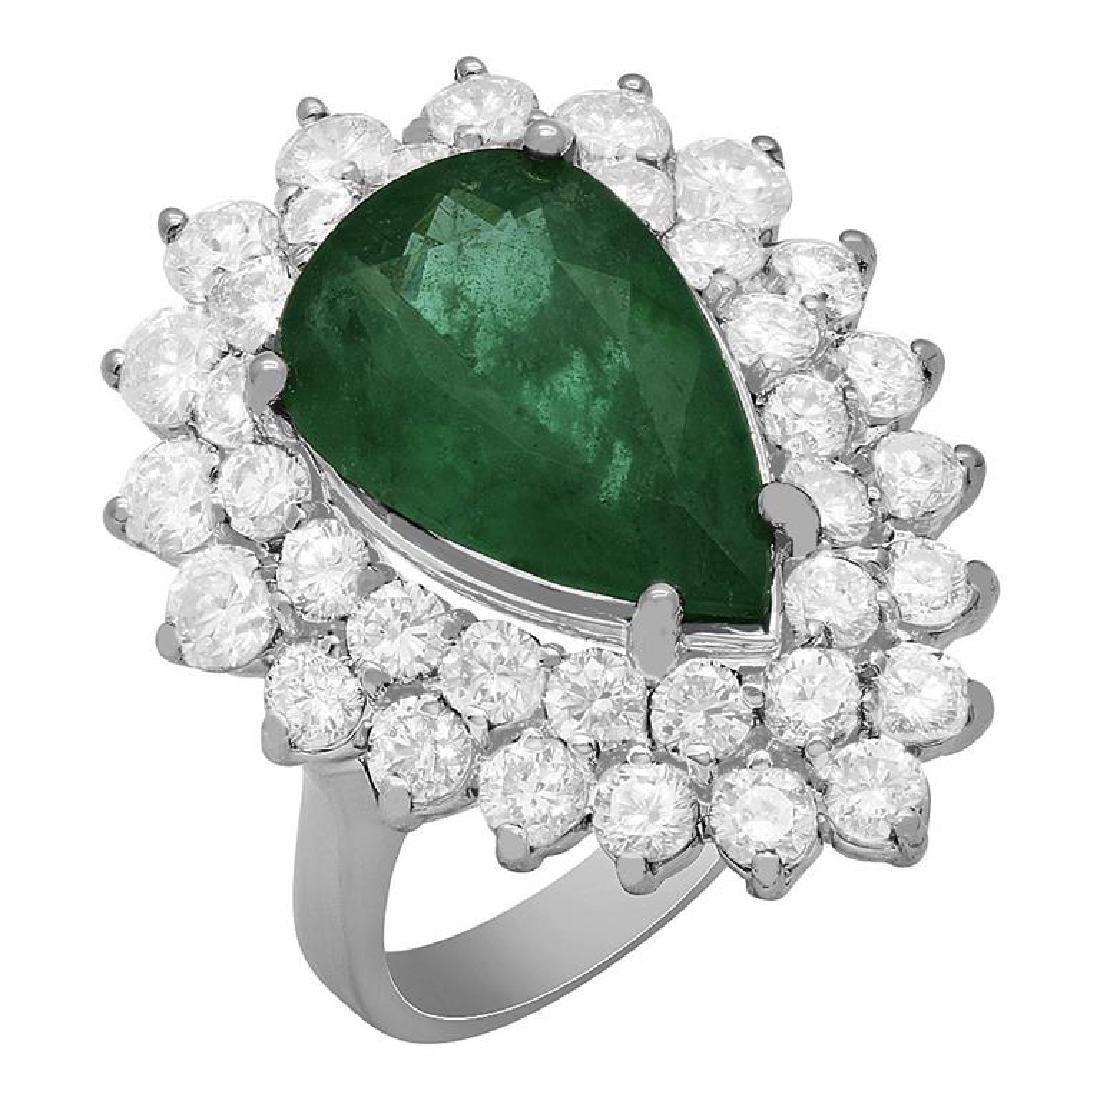 14k White Gold 5.20ct Emerald 2.78ct Diamond Ring